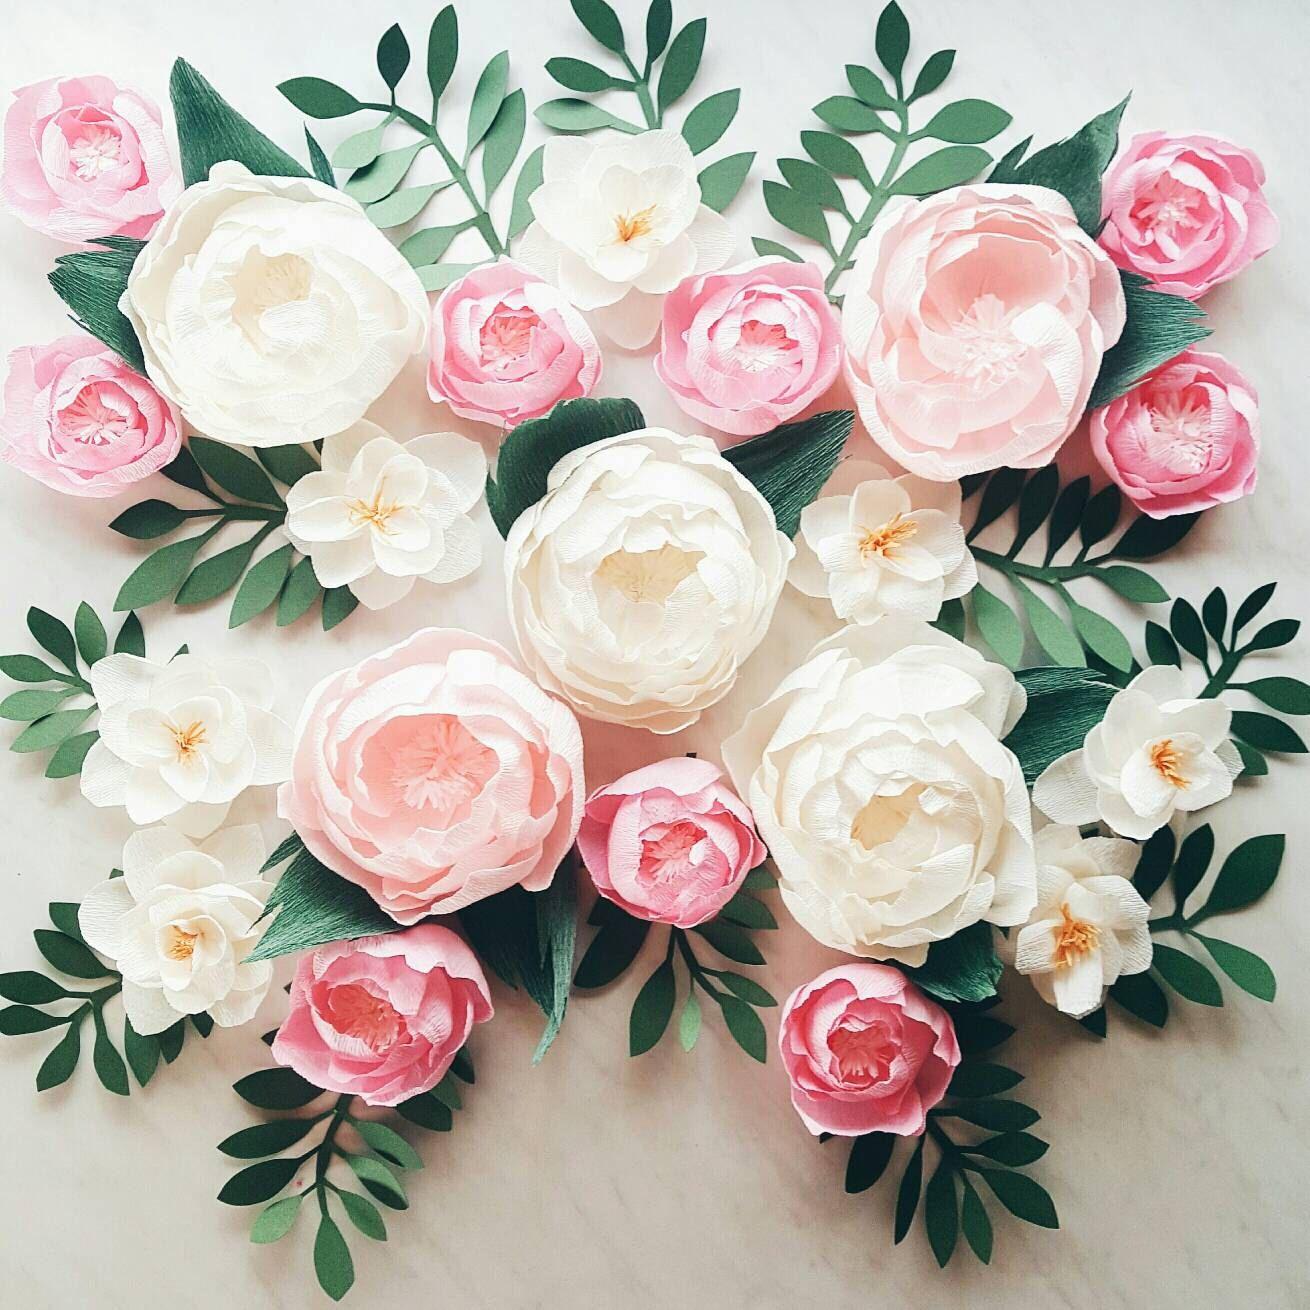 Paper Flower Wall Display Girl Nursery Wall Decor Garden Party